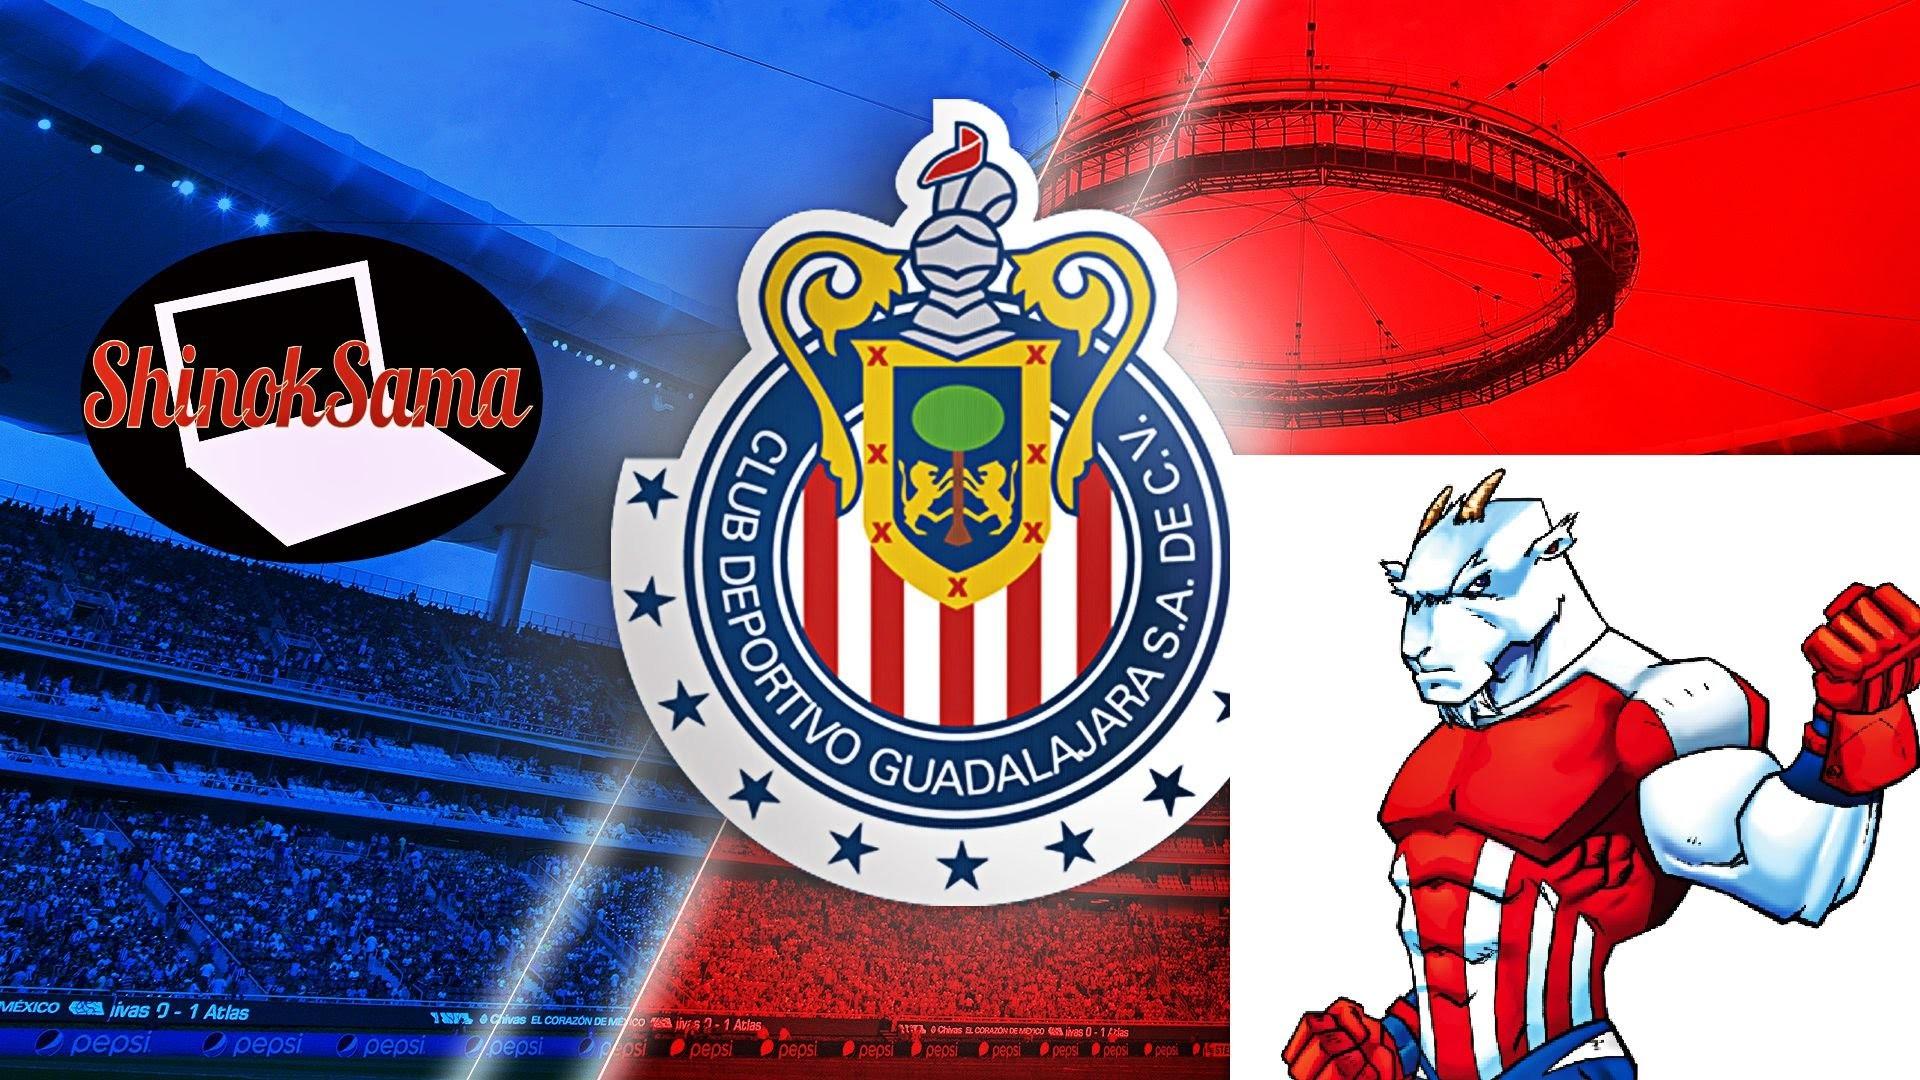 Deadpool Logo Wallpaper Hd Chivas De Guadalajara Wallpapers 66 Images